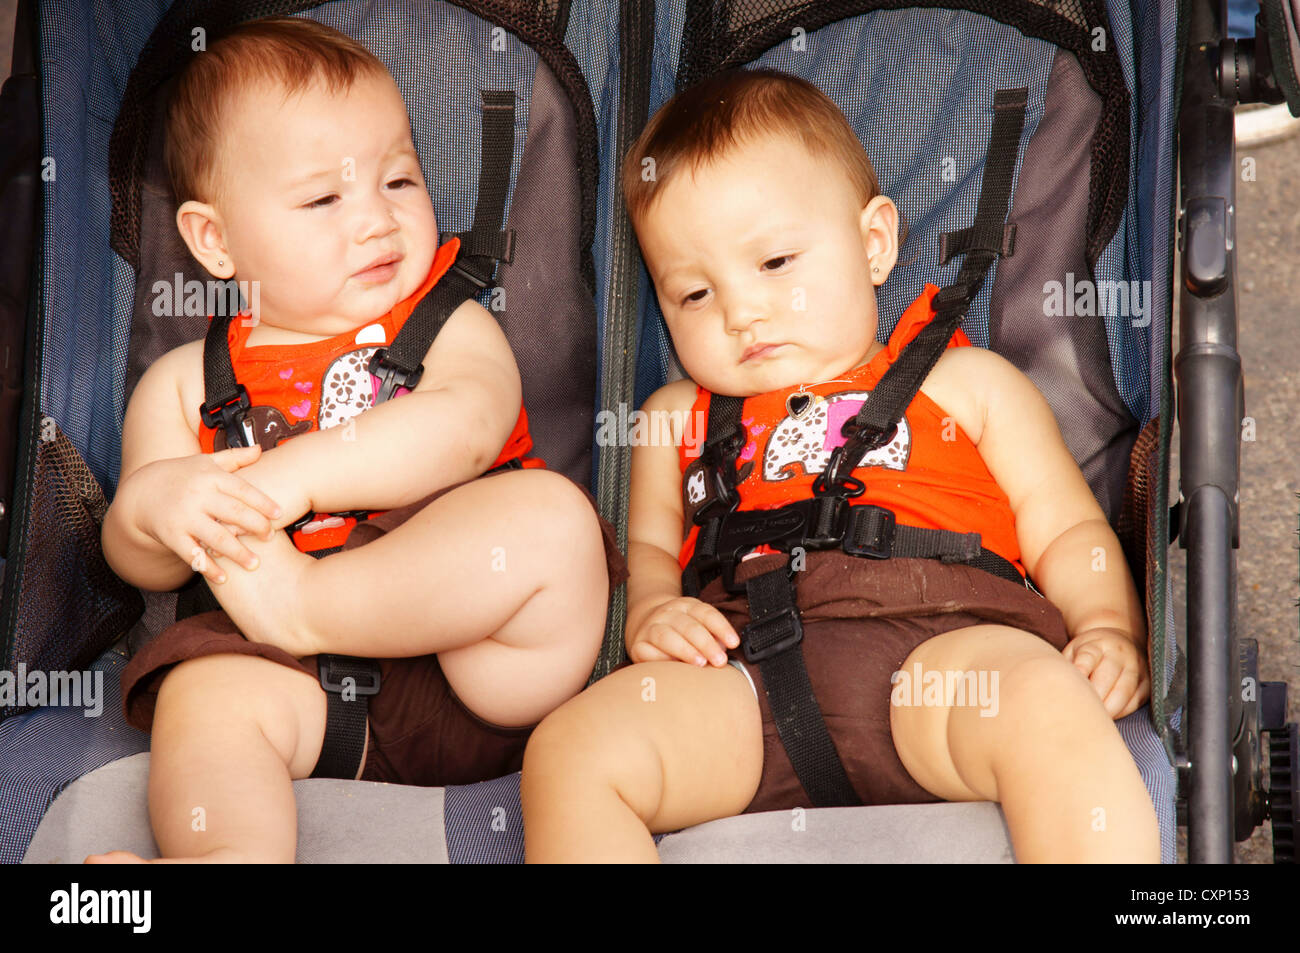 twin baby hispanic latino boys babies portrait headshot